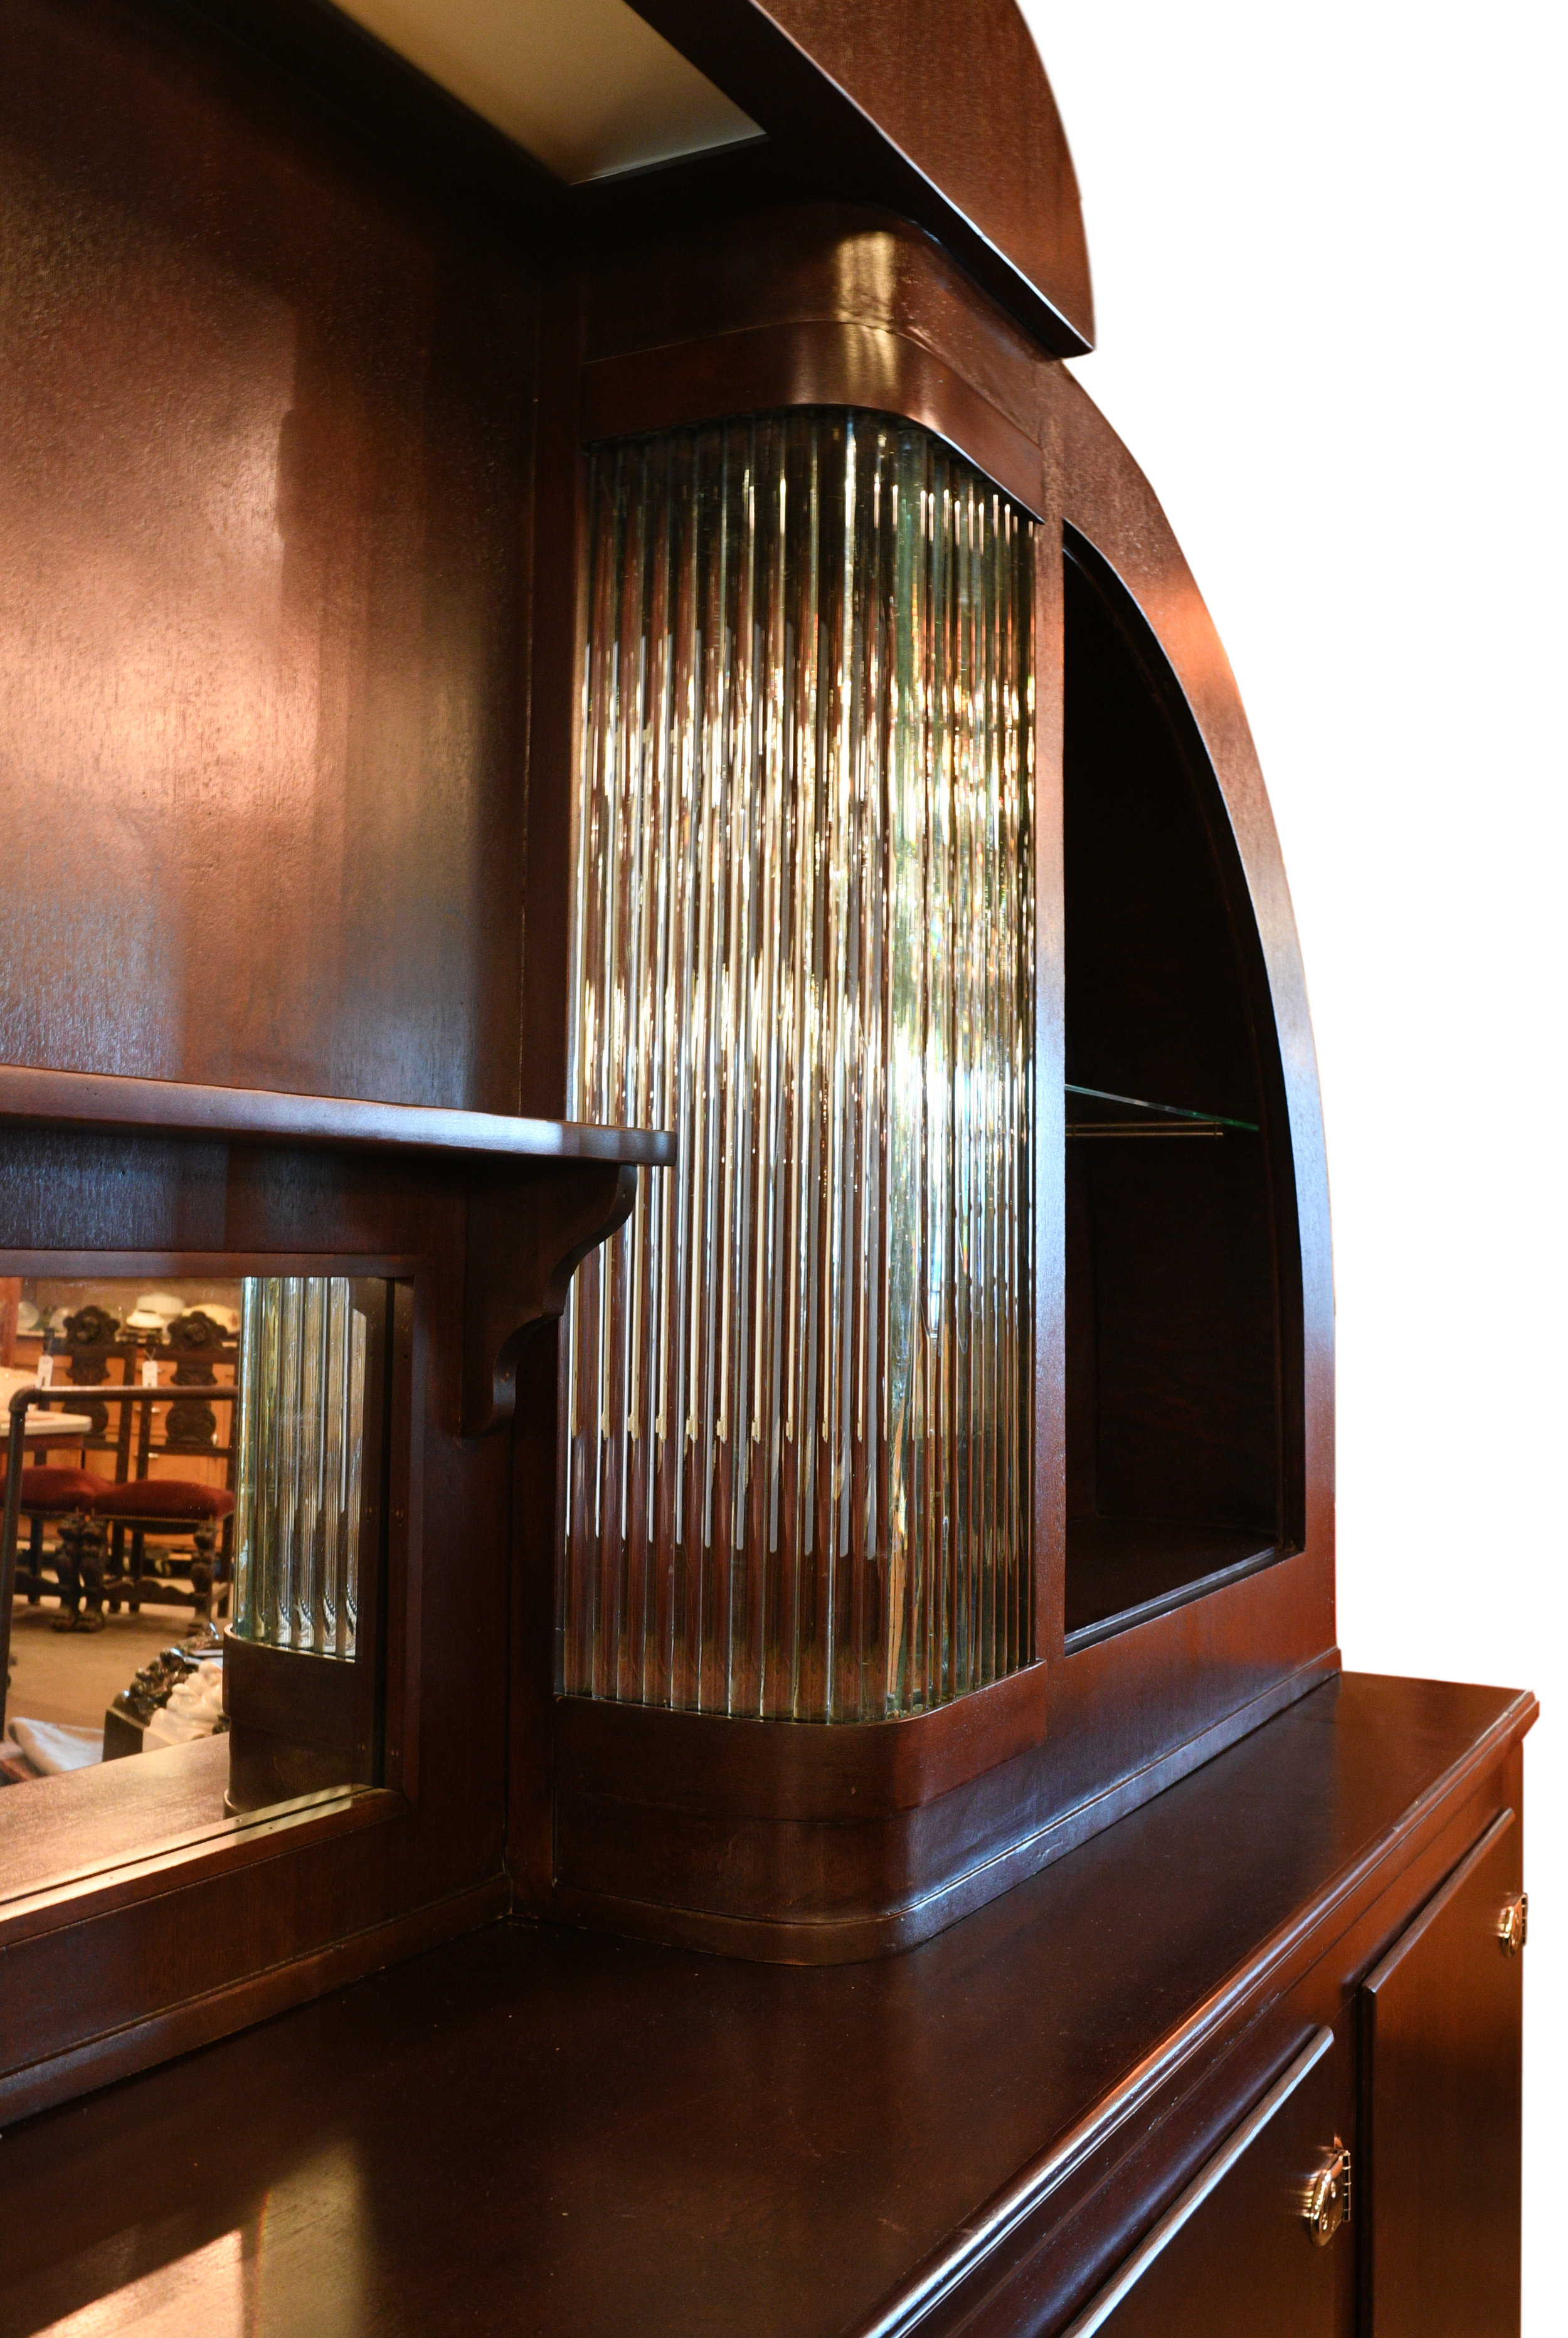 47687-art-deco-bar-with-glass-rods-details-15.jpg